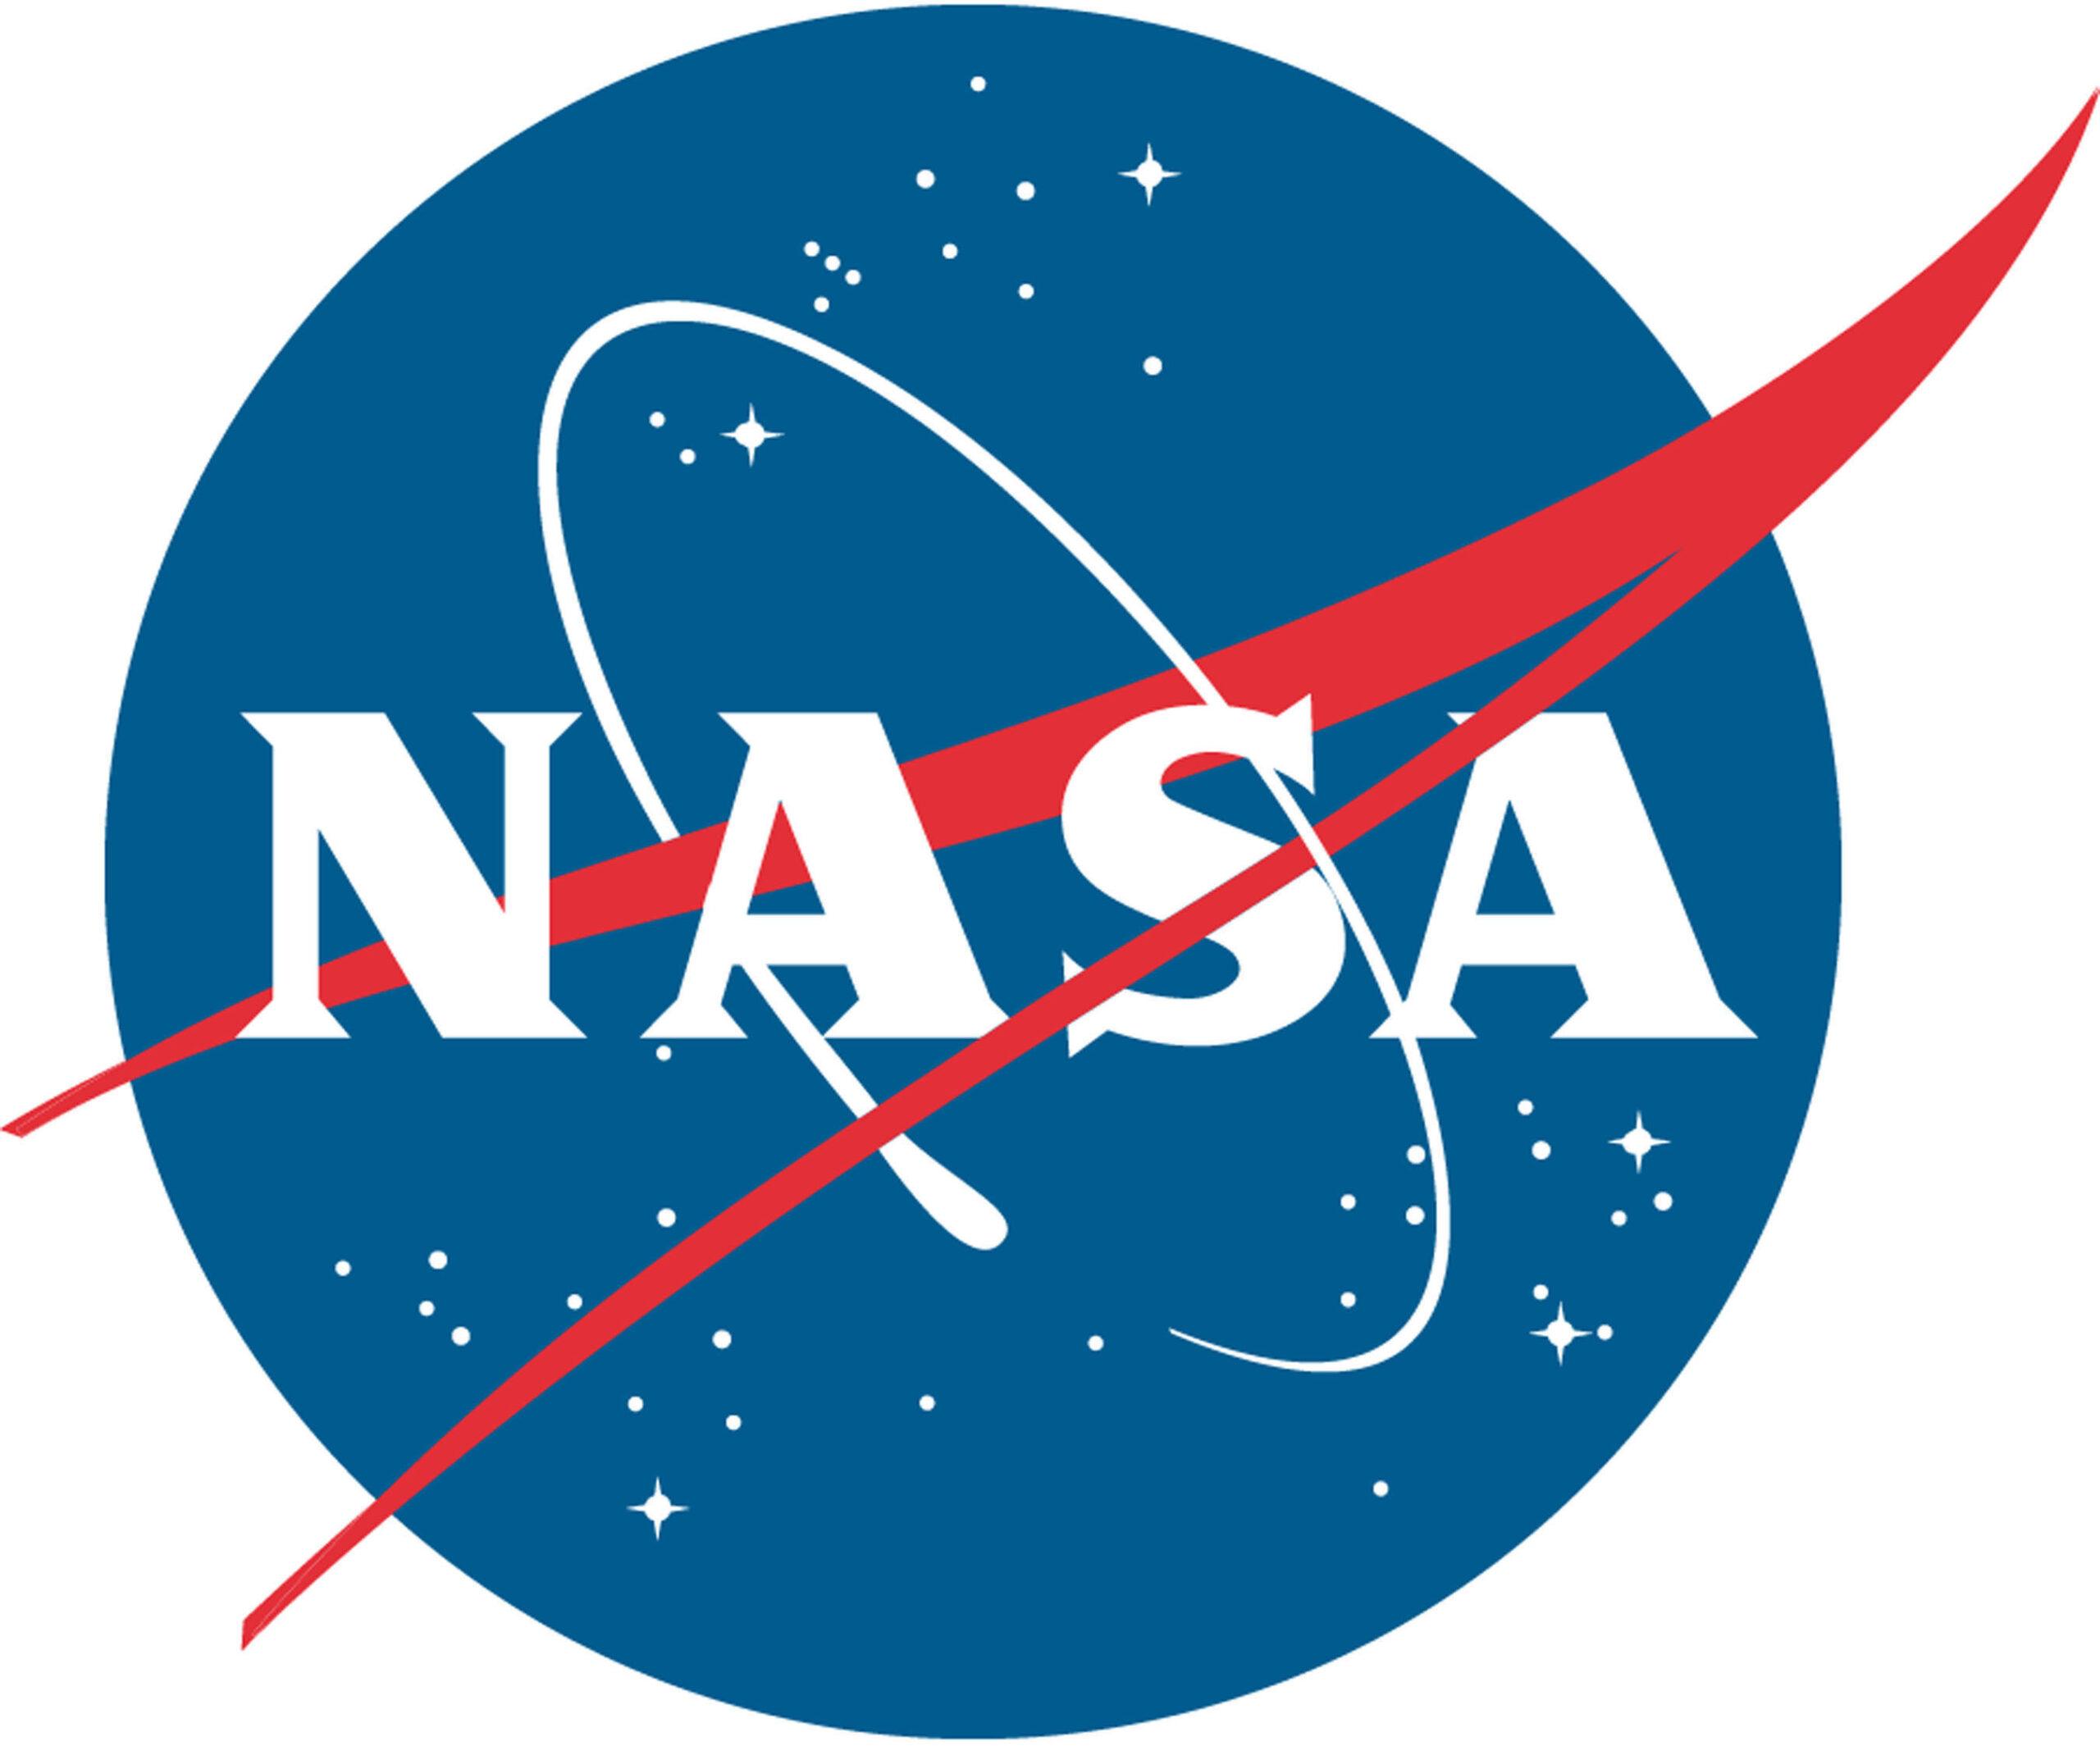 NASA Invites Students, Educators to Join Artemis I Mission